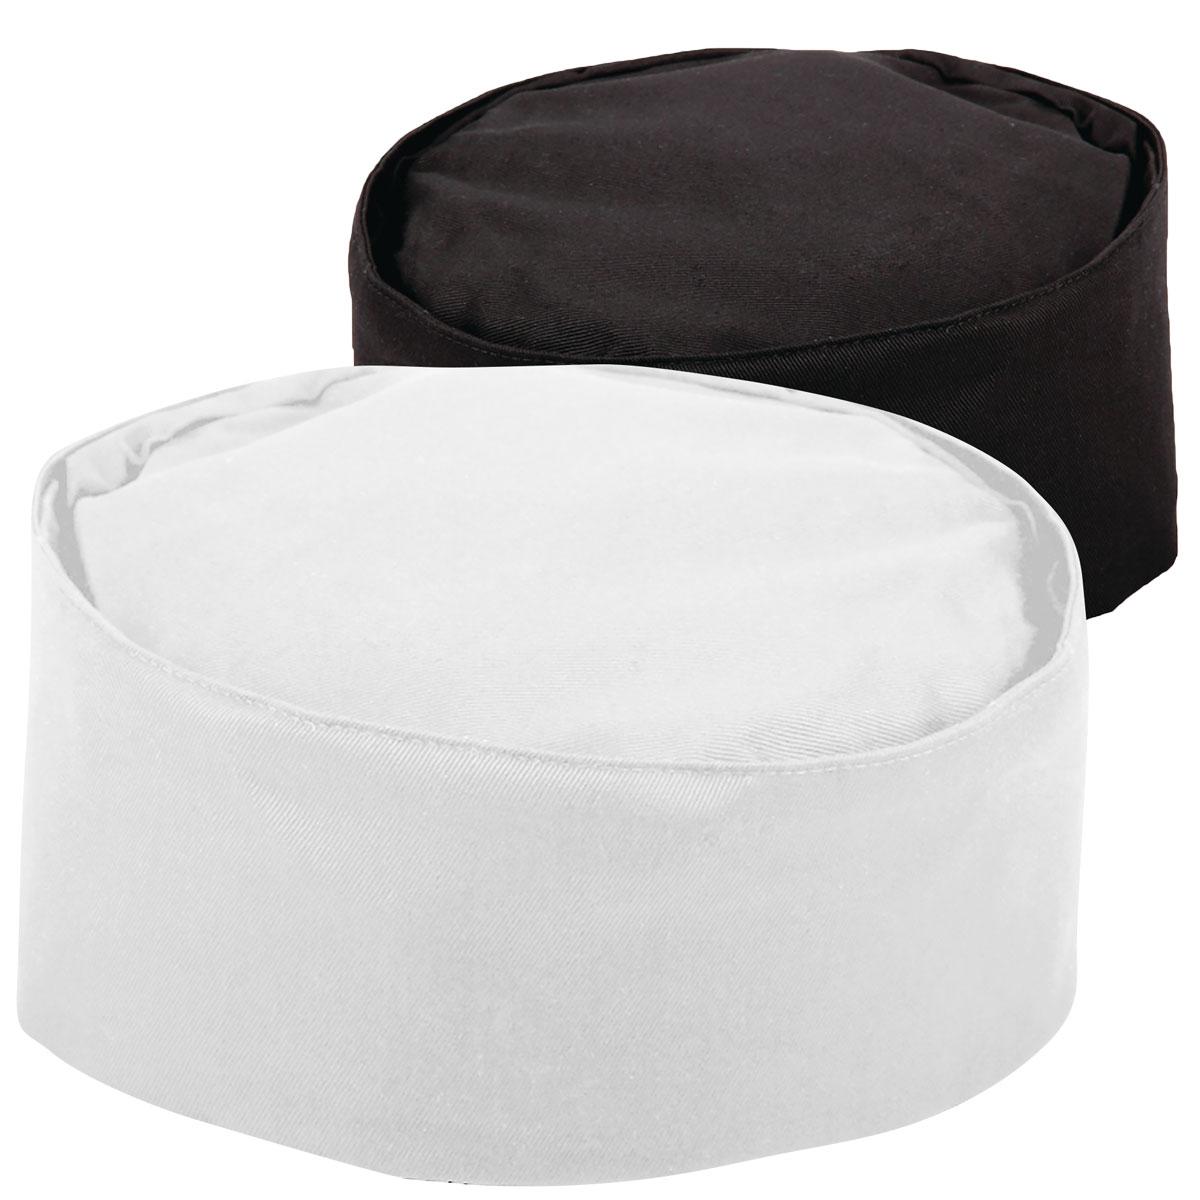 Unisex Chefs Hat - CHAT1